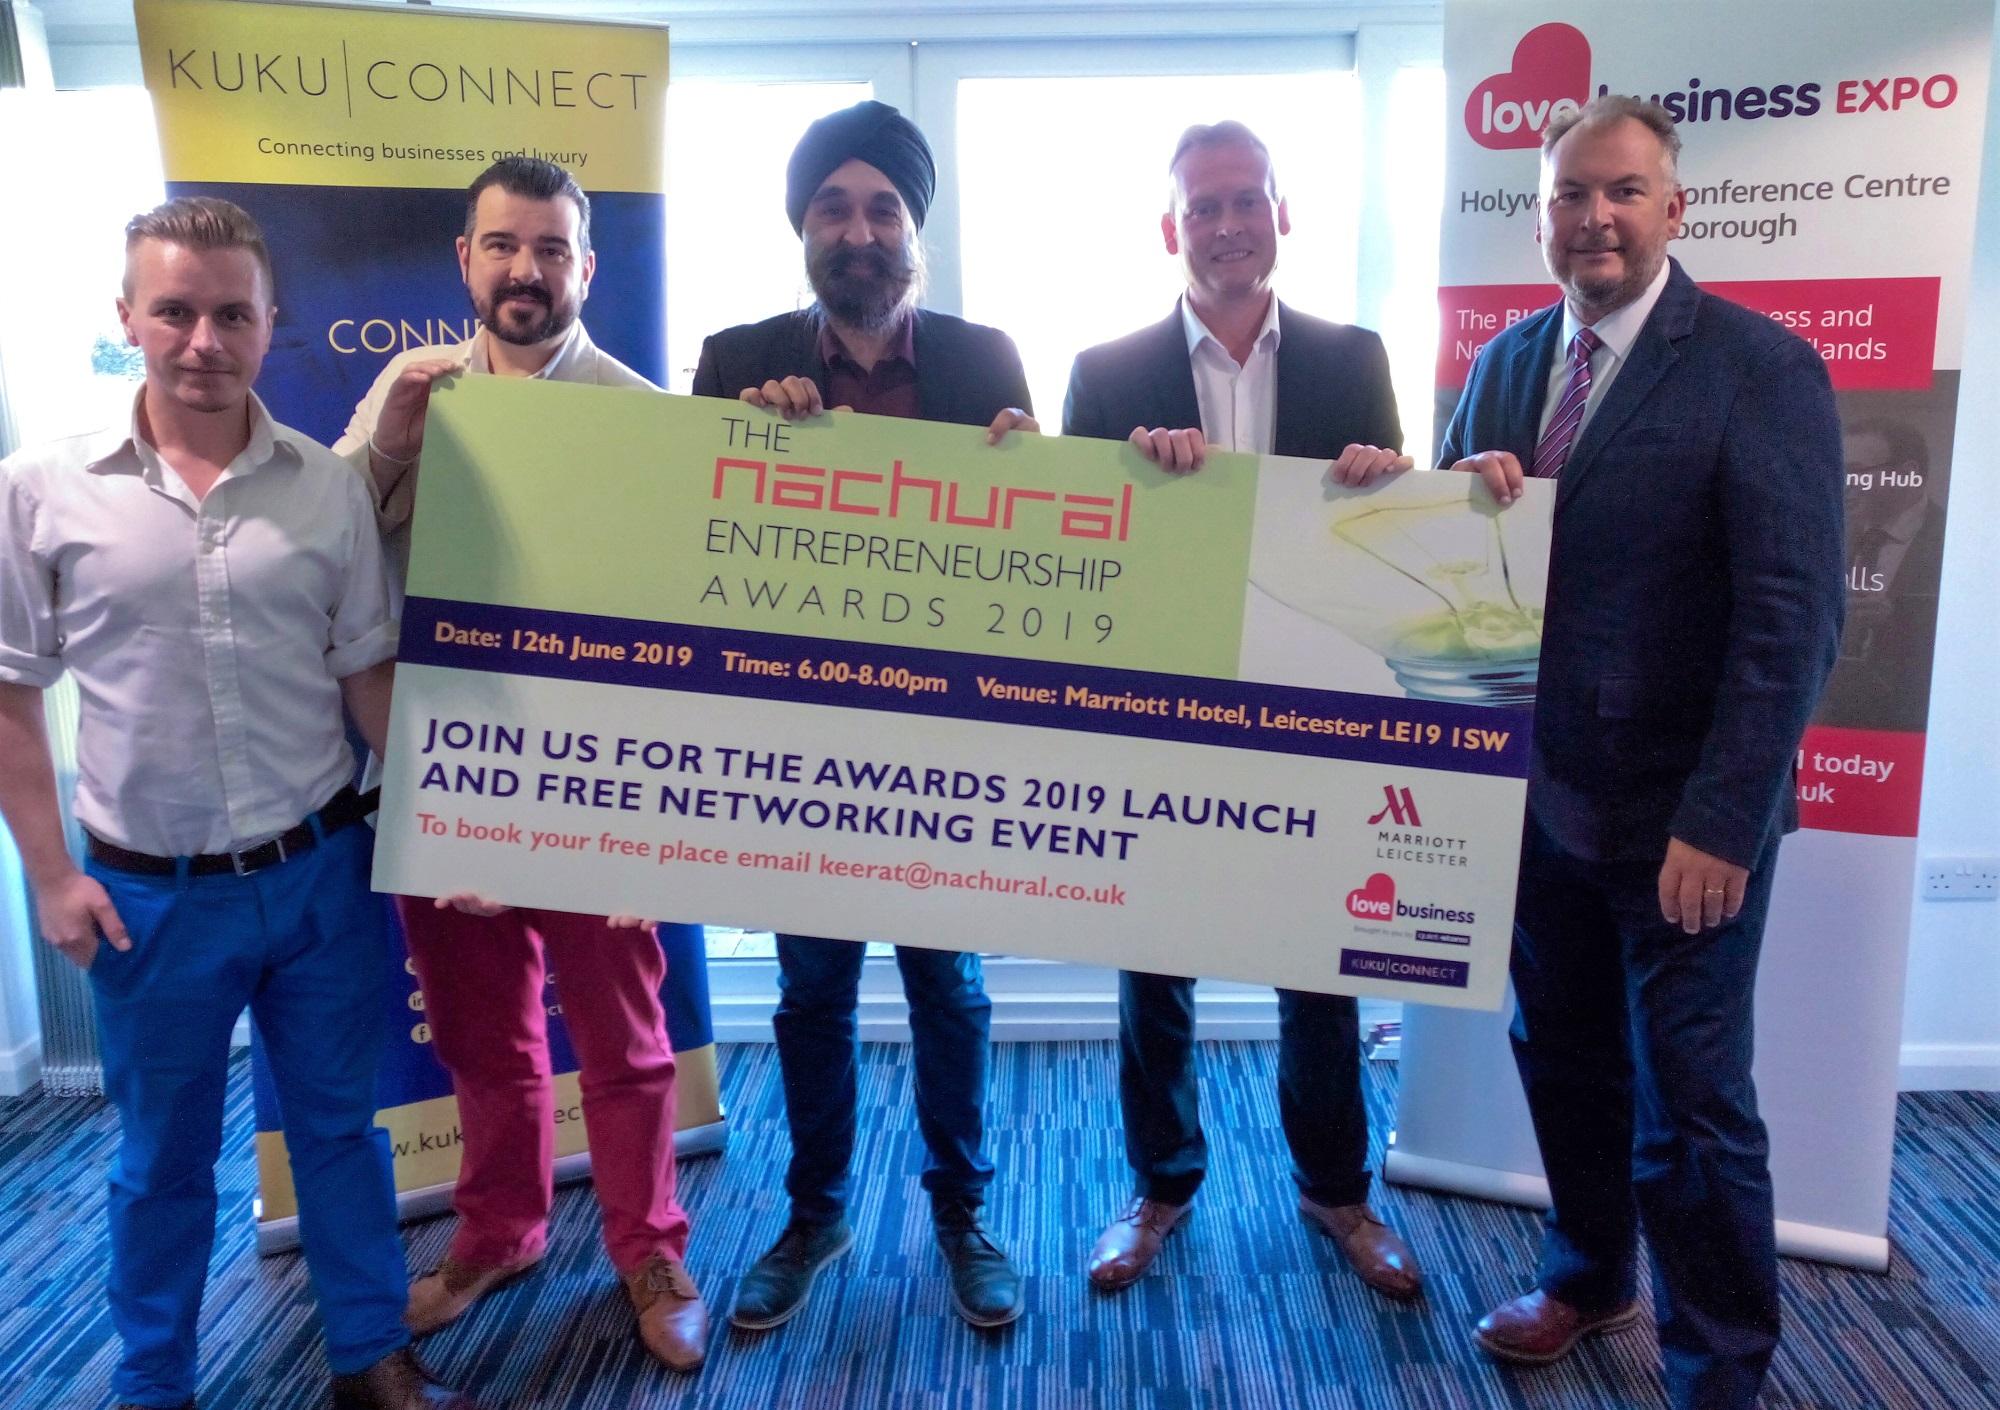 Love Business and KuKu Connect back Nachural Entrepreneurship Awards